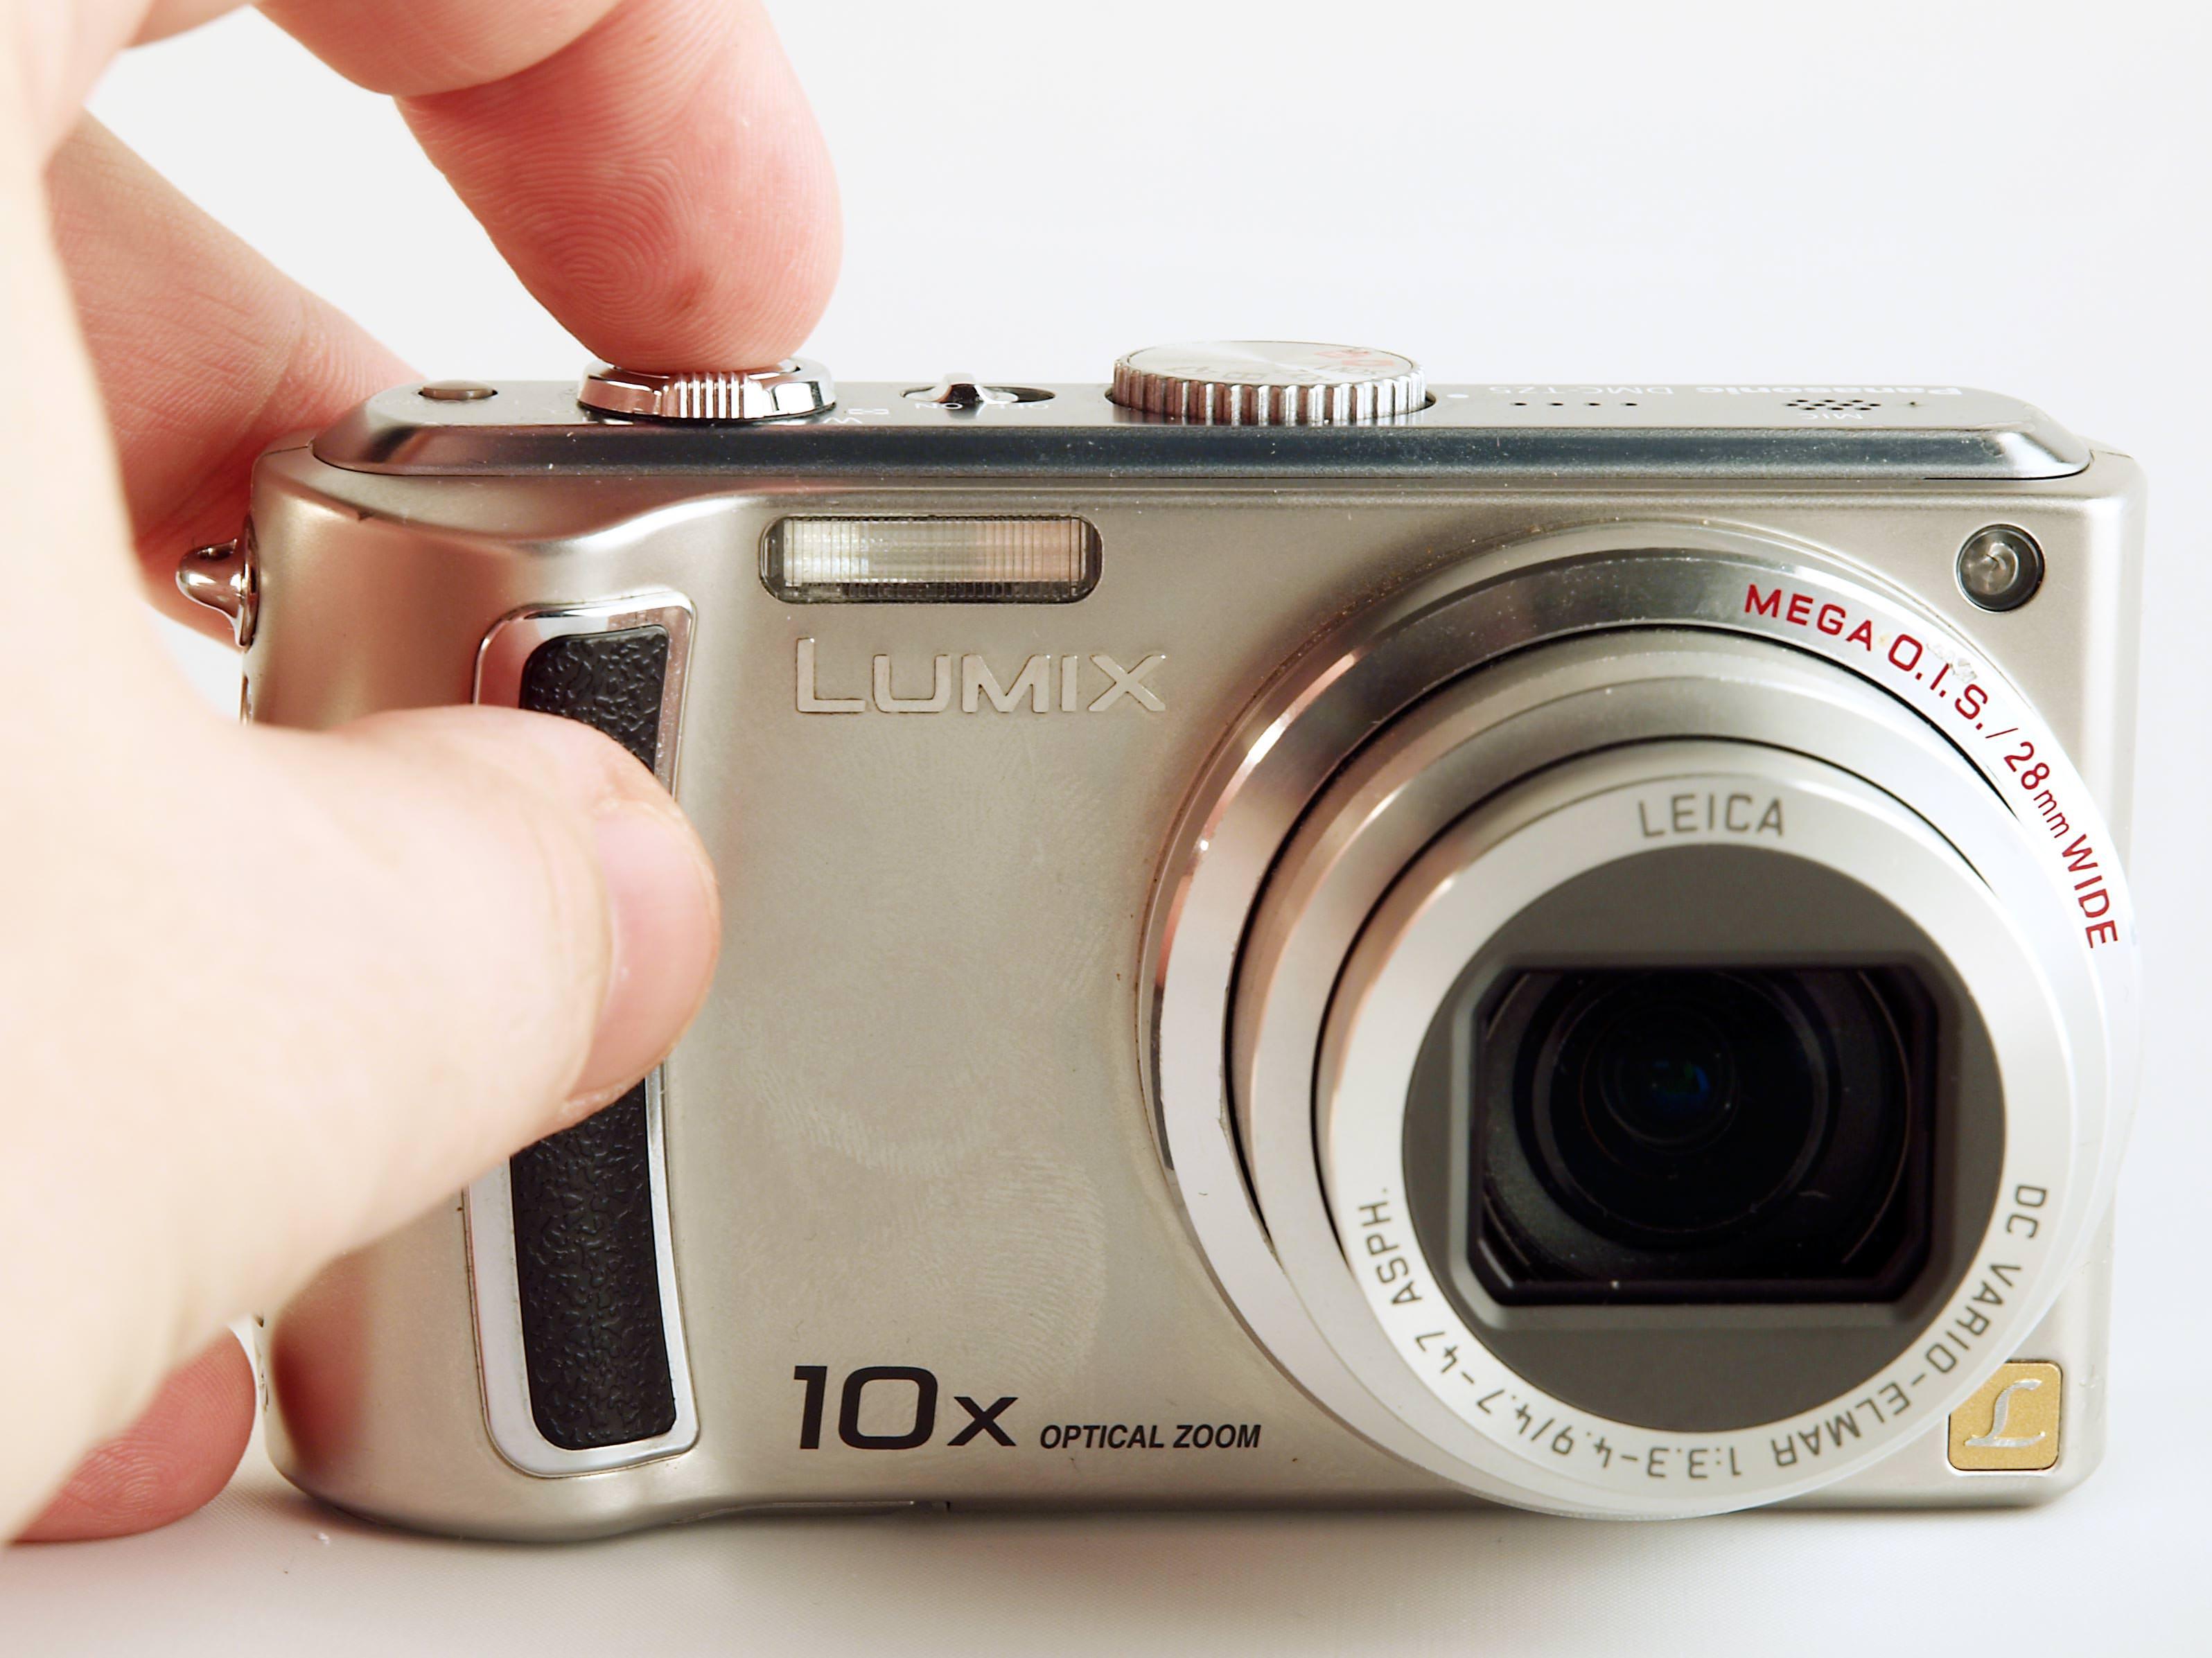 panasonic lumix dmc tz5 digital camera review rh ephotozine com panasonic lumix dmc-tz5 manual download panasonic lumix dmc-tz5 manual